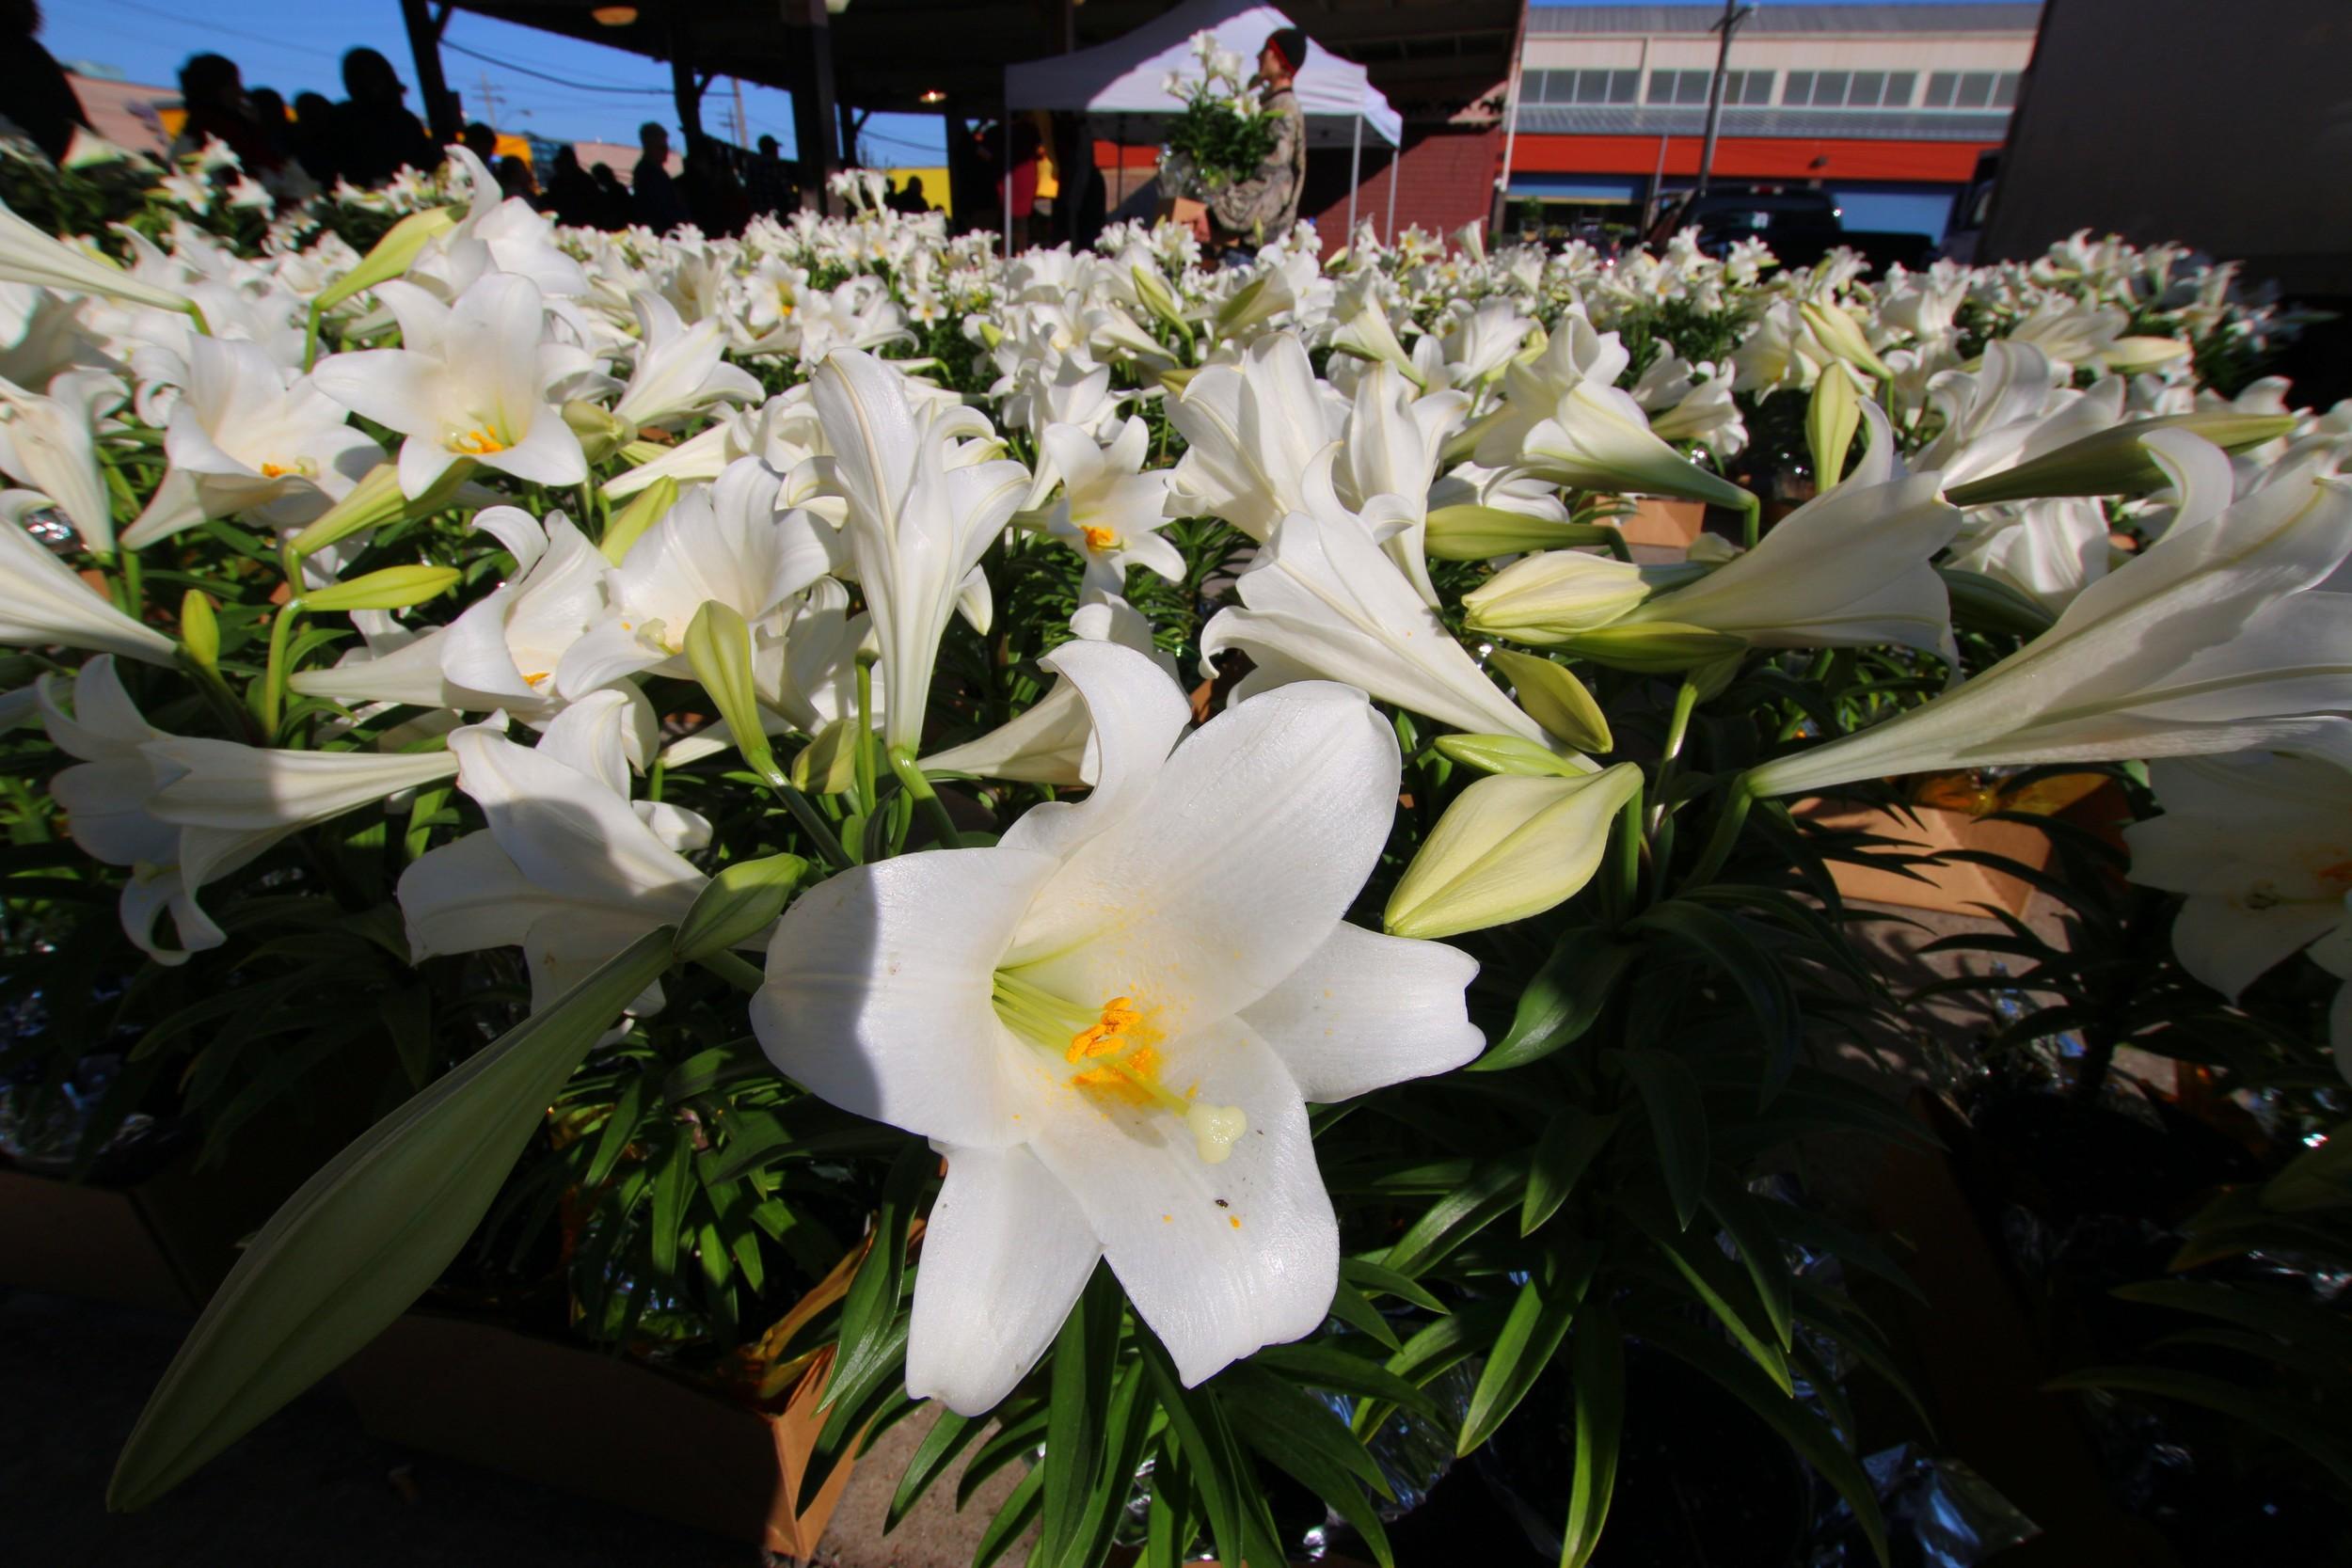 Easter Lilies - Eastern Market, Detroit, MI - April 2014